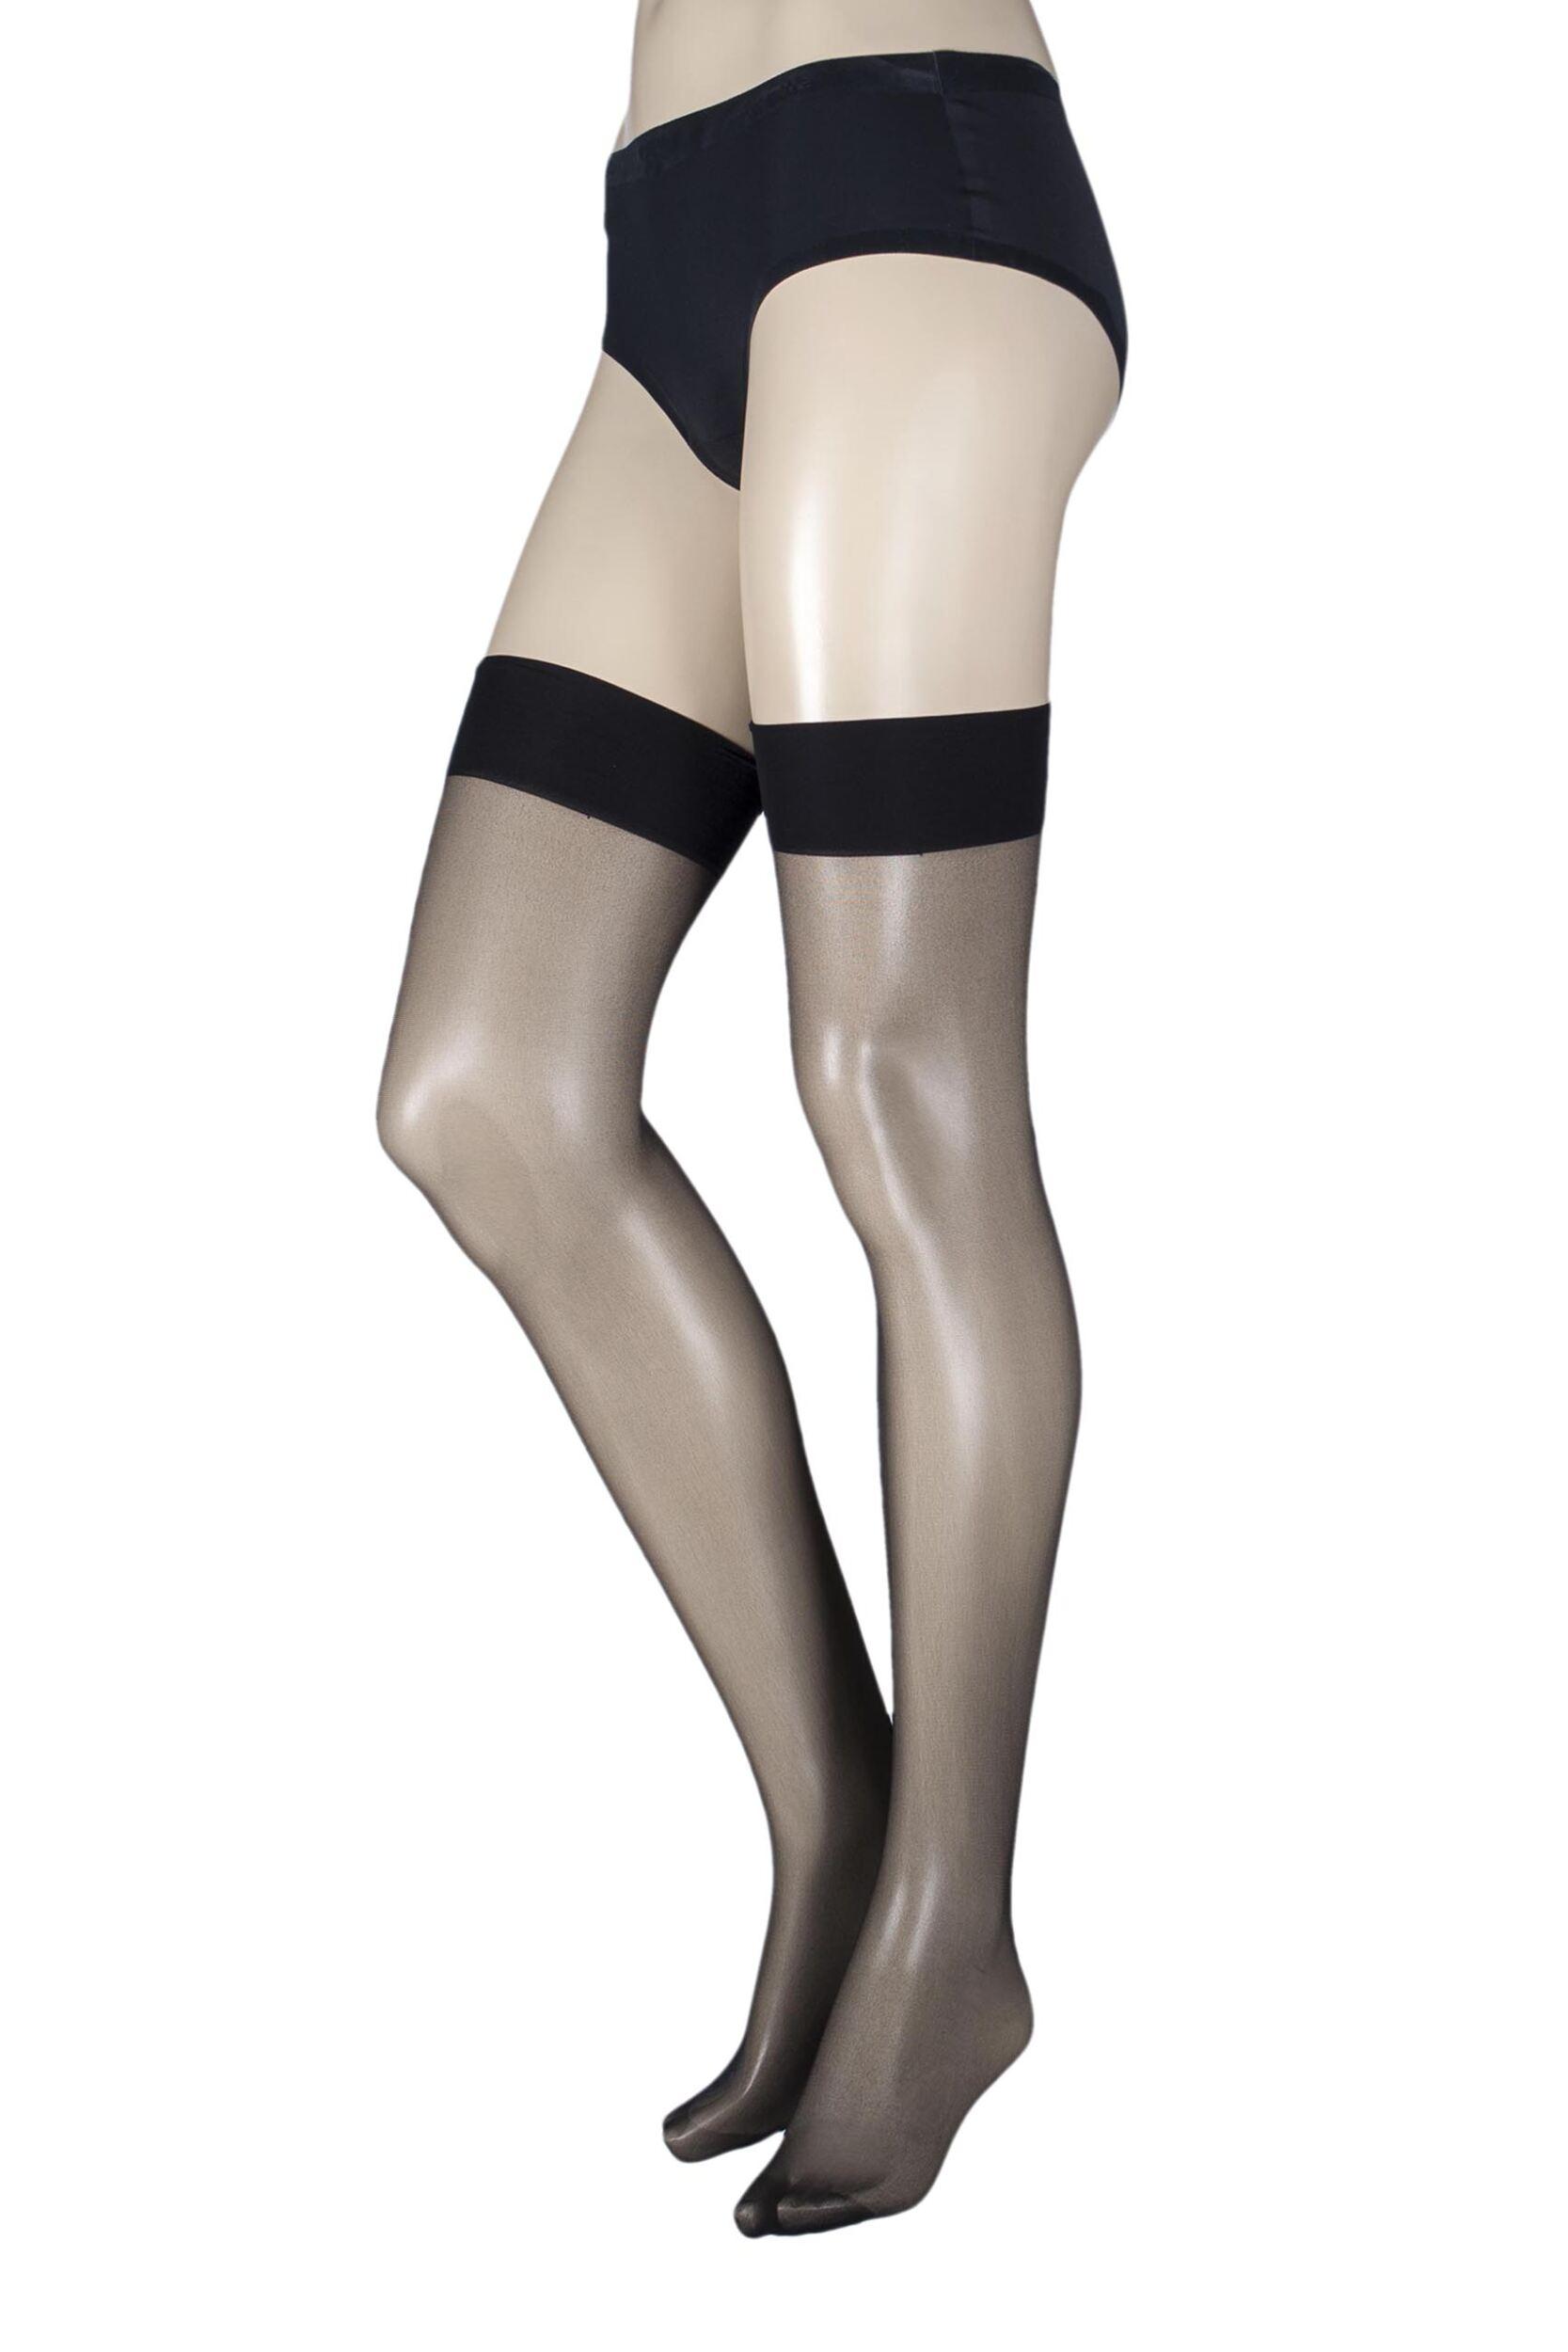 Plus Size Ladies 1 Pair Black 15 Denier Gloss Tight with Lycra